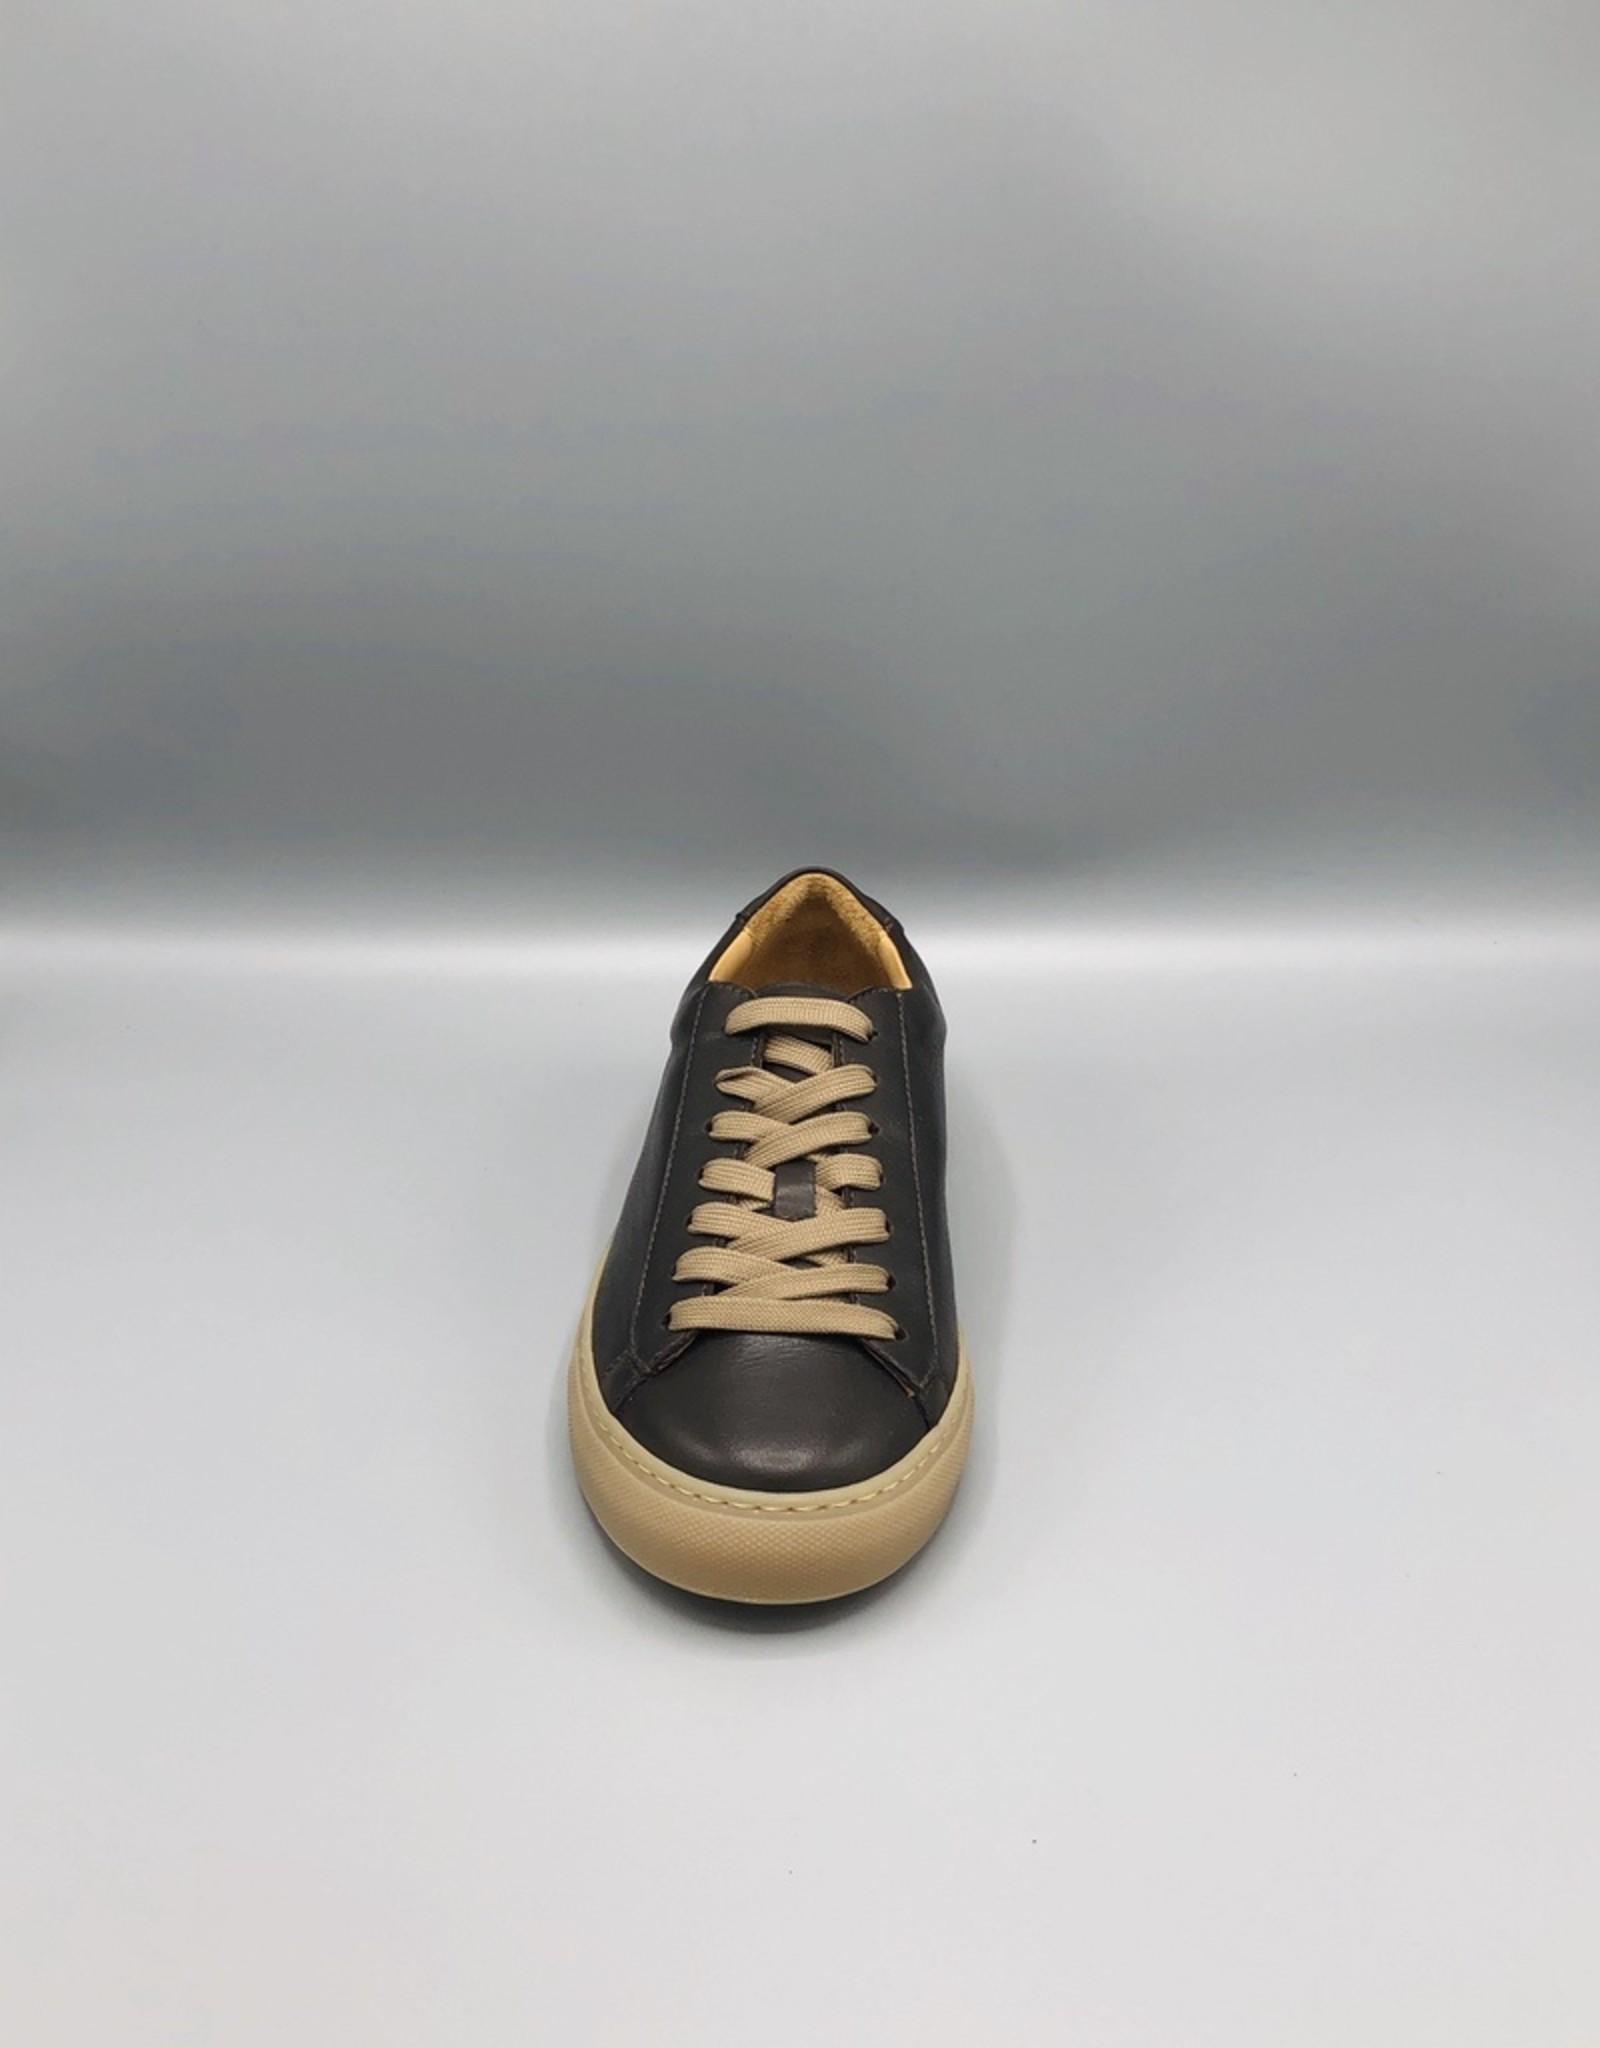 Manovie Toscane Manovie Toscane Filo Gum Sole Leather Sneaker